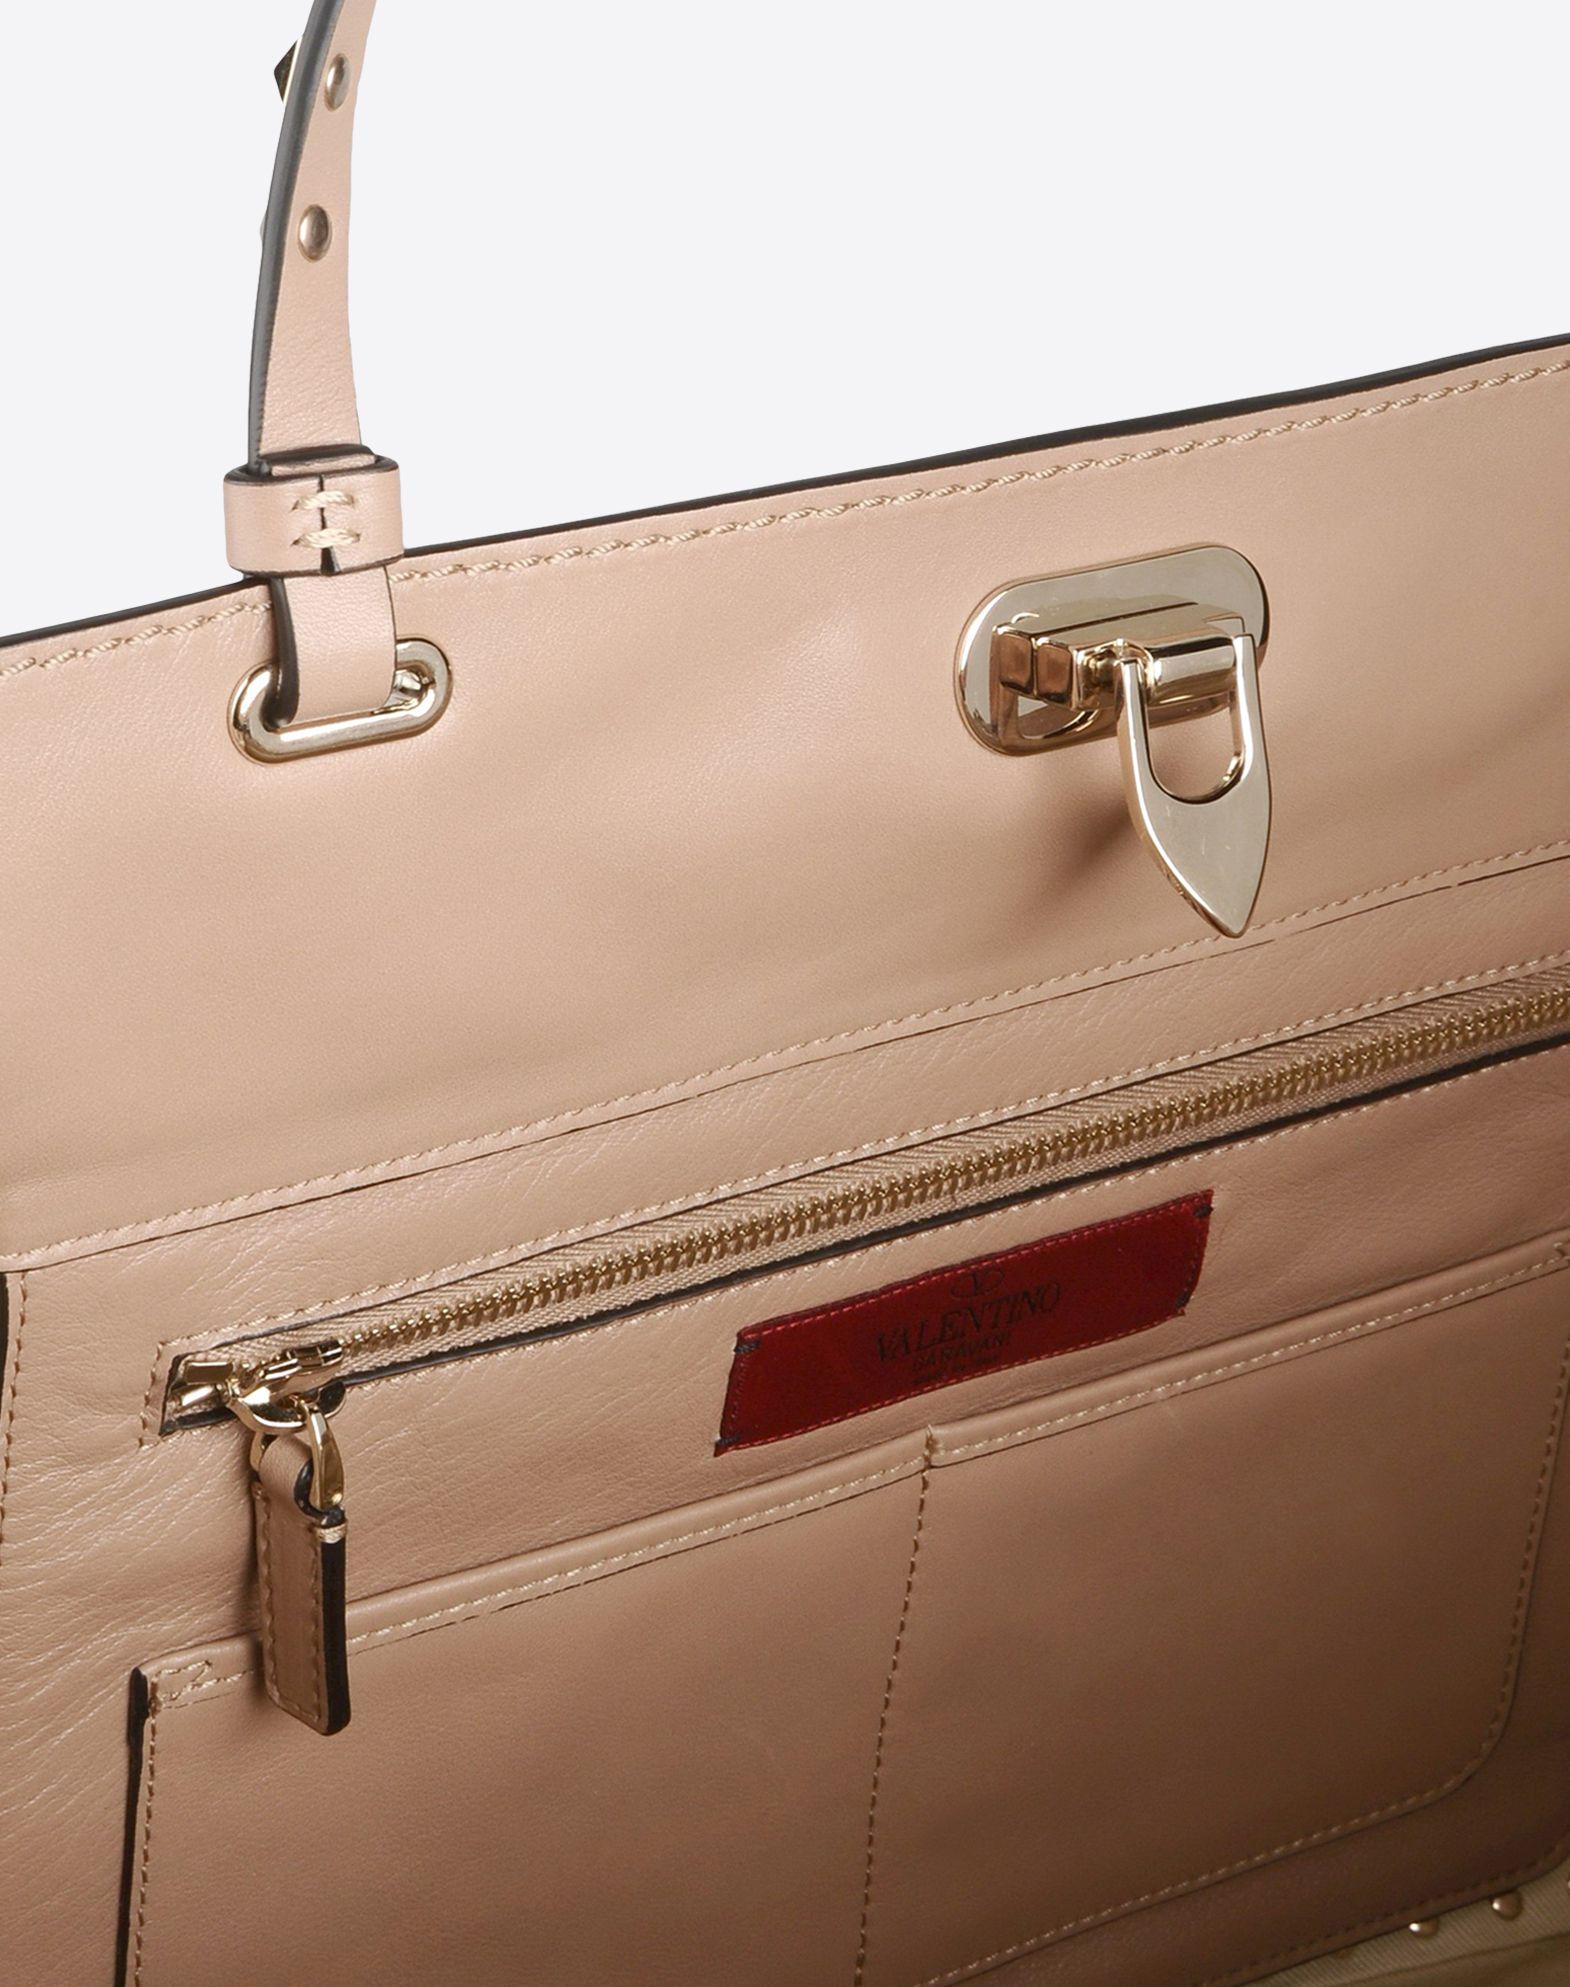 VALENTINO Solid color Framed closure Internal pockets Dual straps Metallic inserts Studs Logo detail  45204015hx